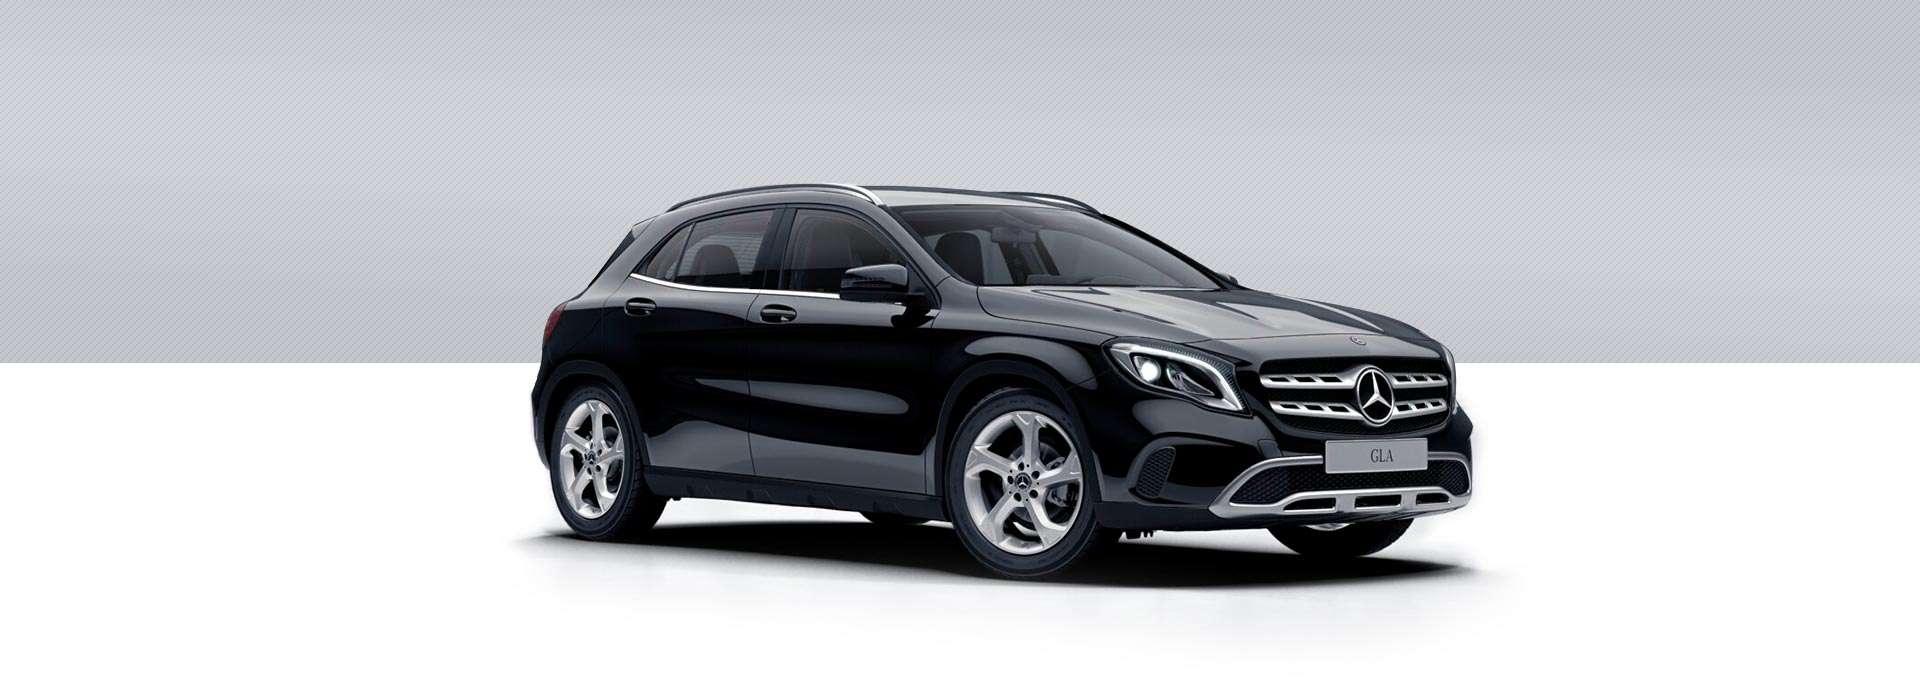 Mercedes Benz GLA SUV